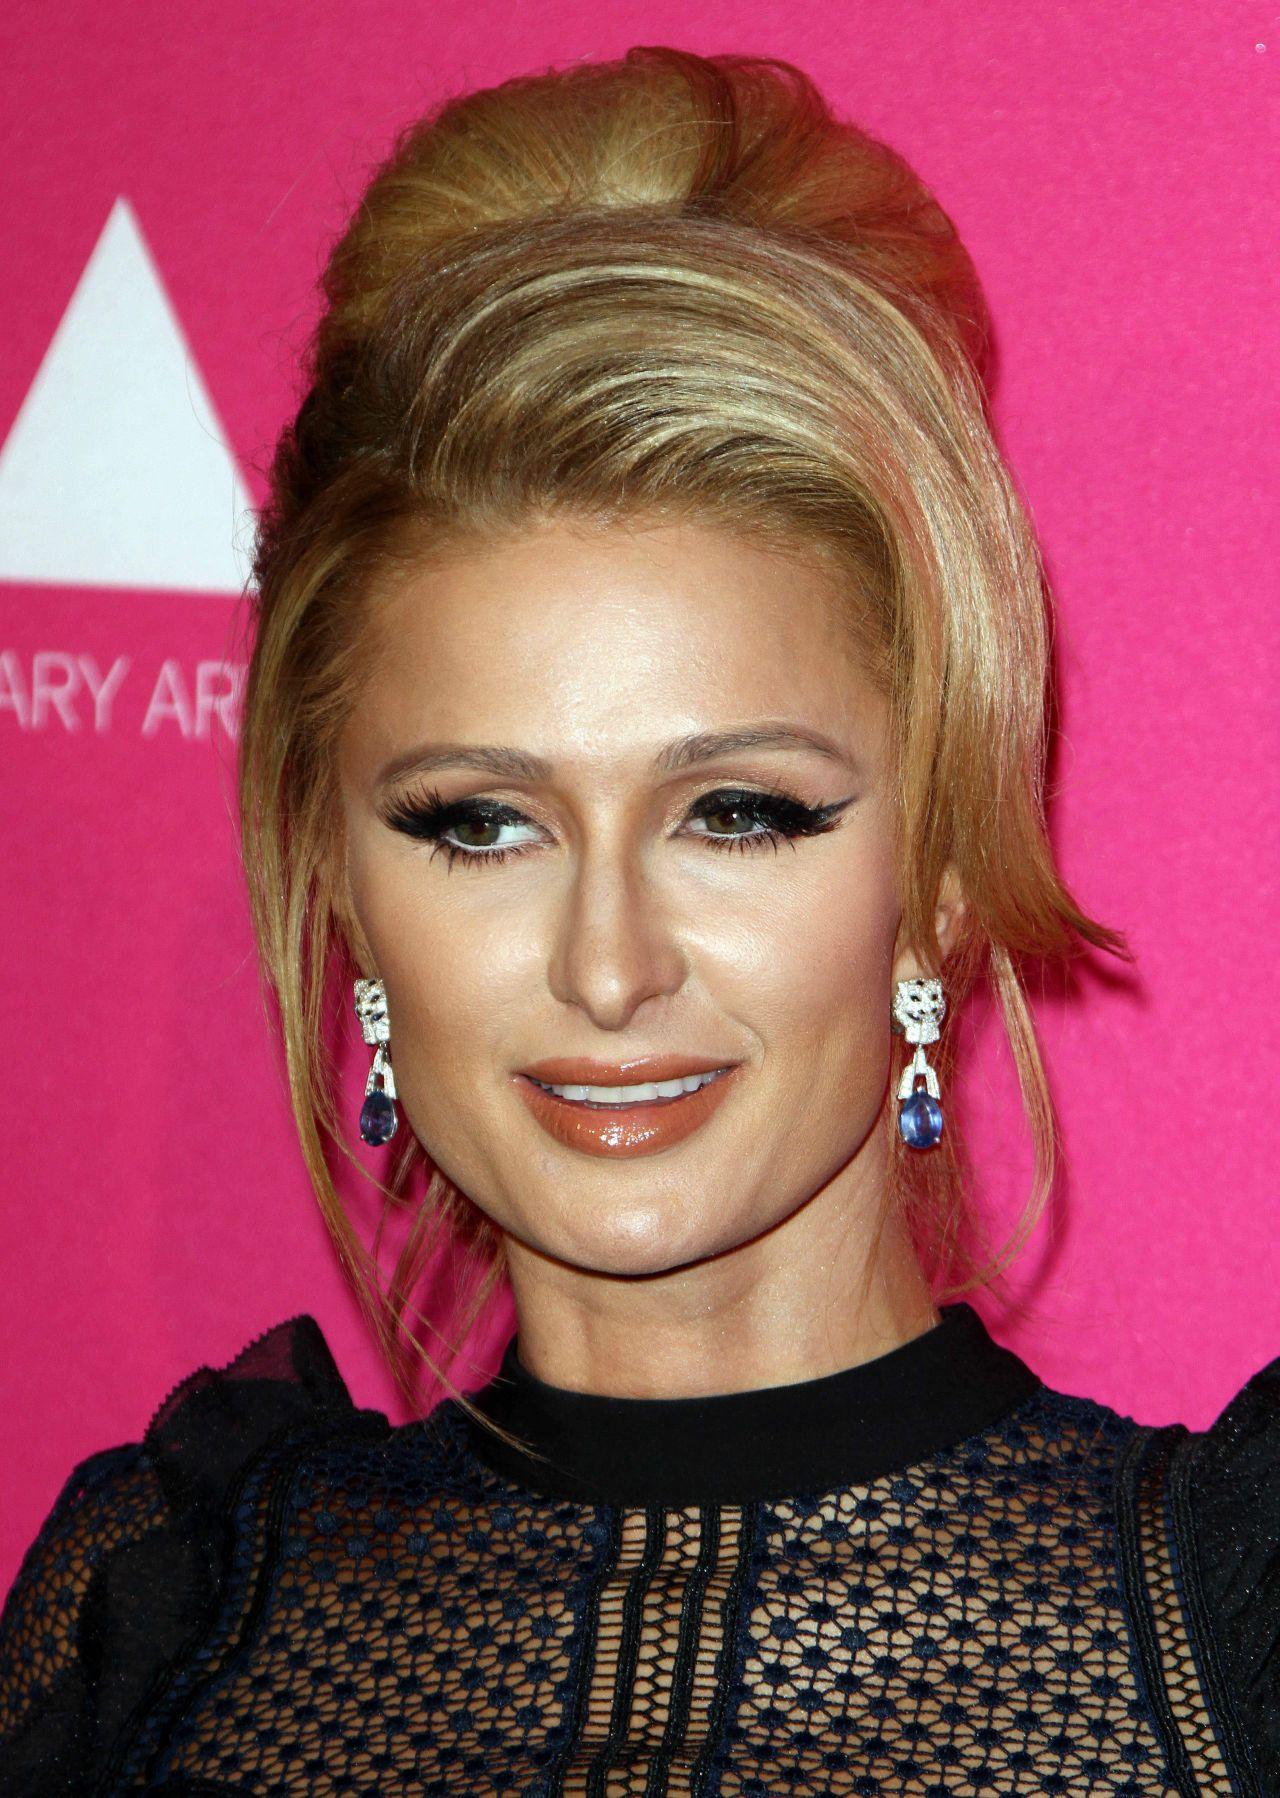 Paris Hilton - MOCA Gala Honoring Jeff Koons in LA 04/29/2017 Paris Hilton